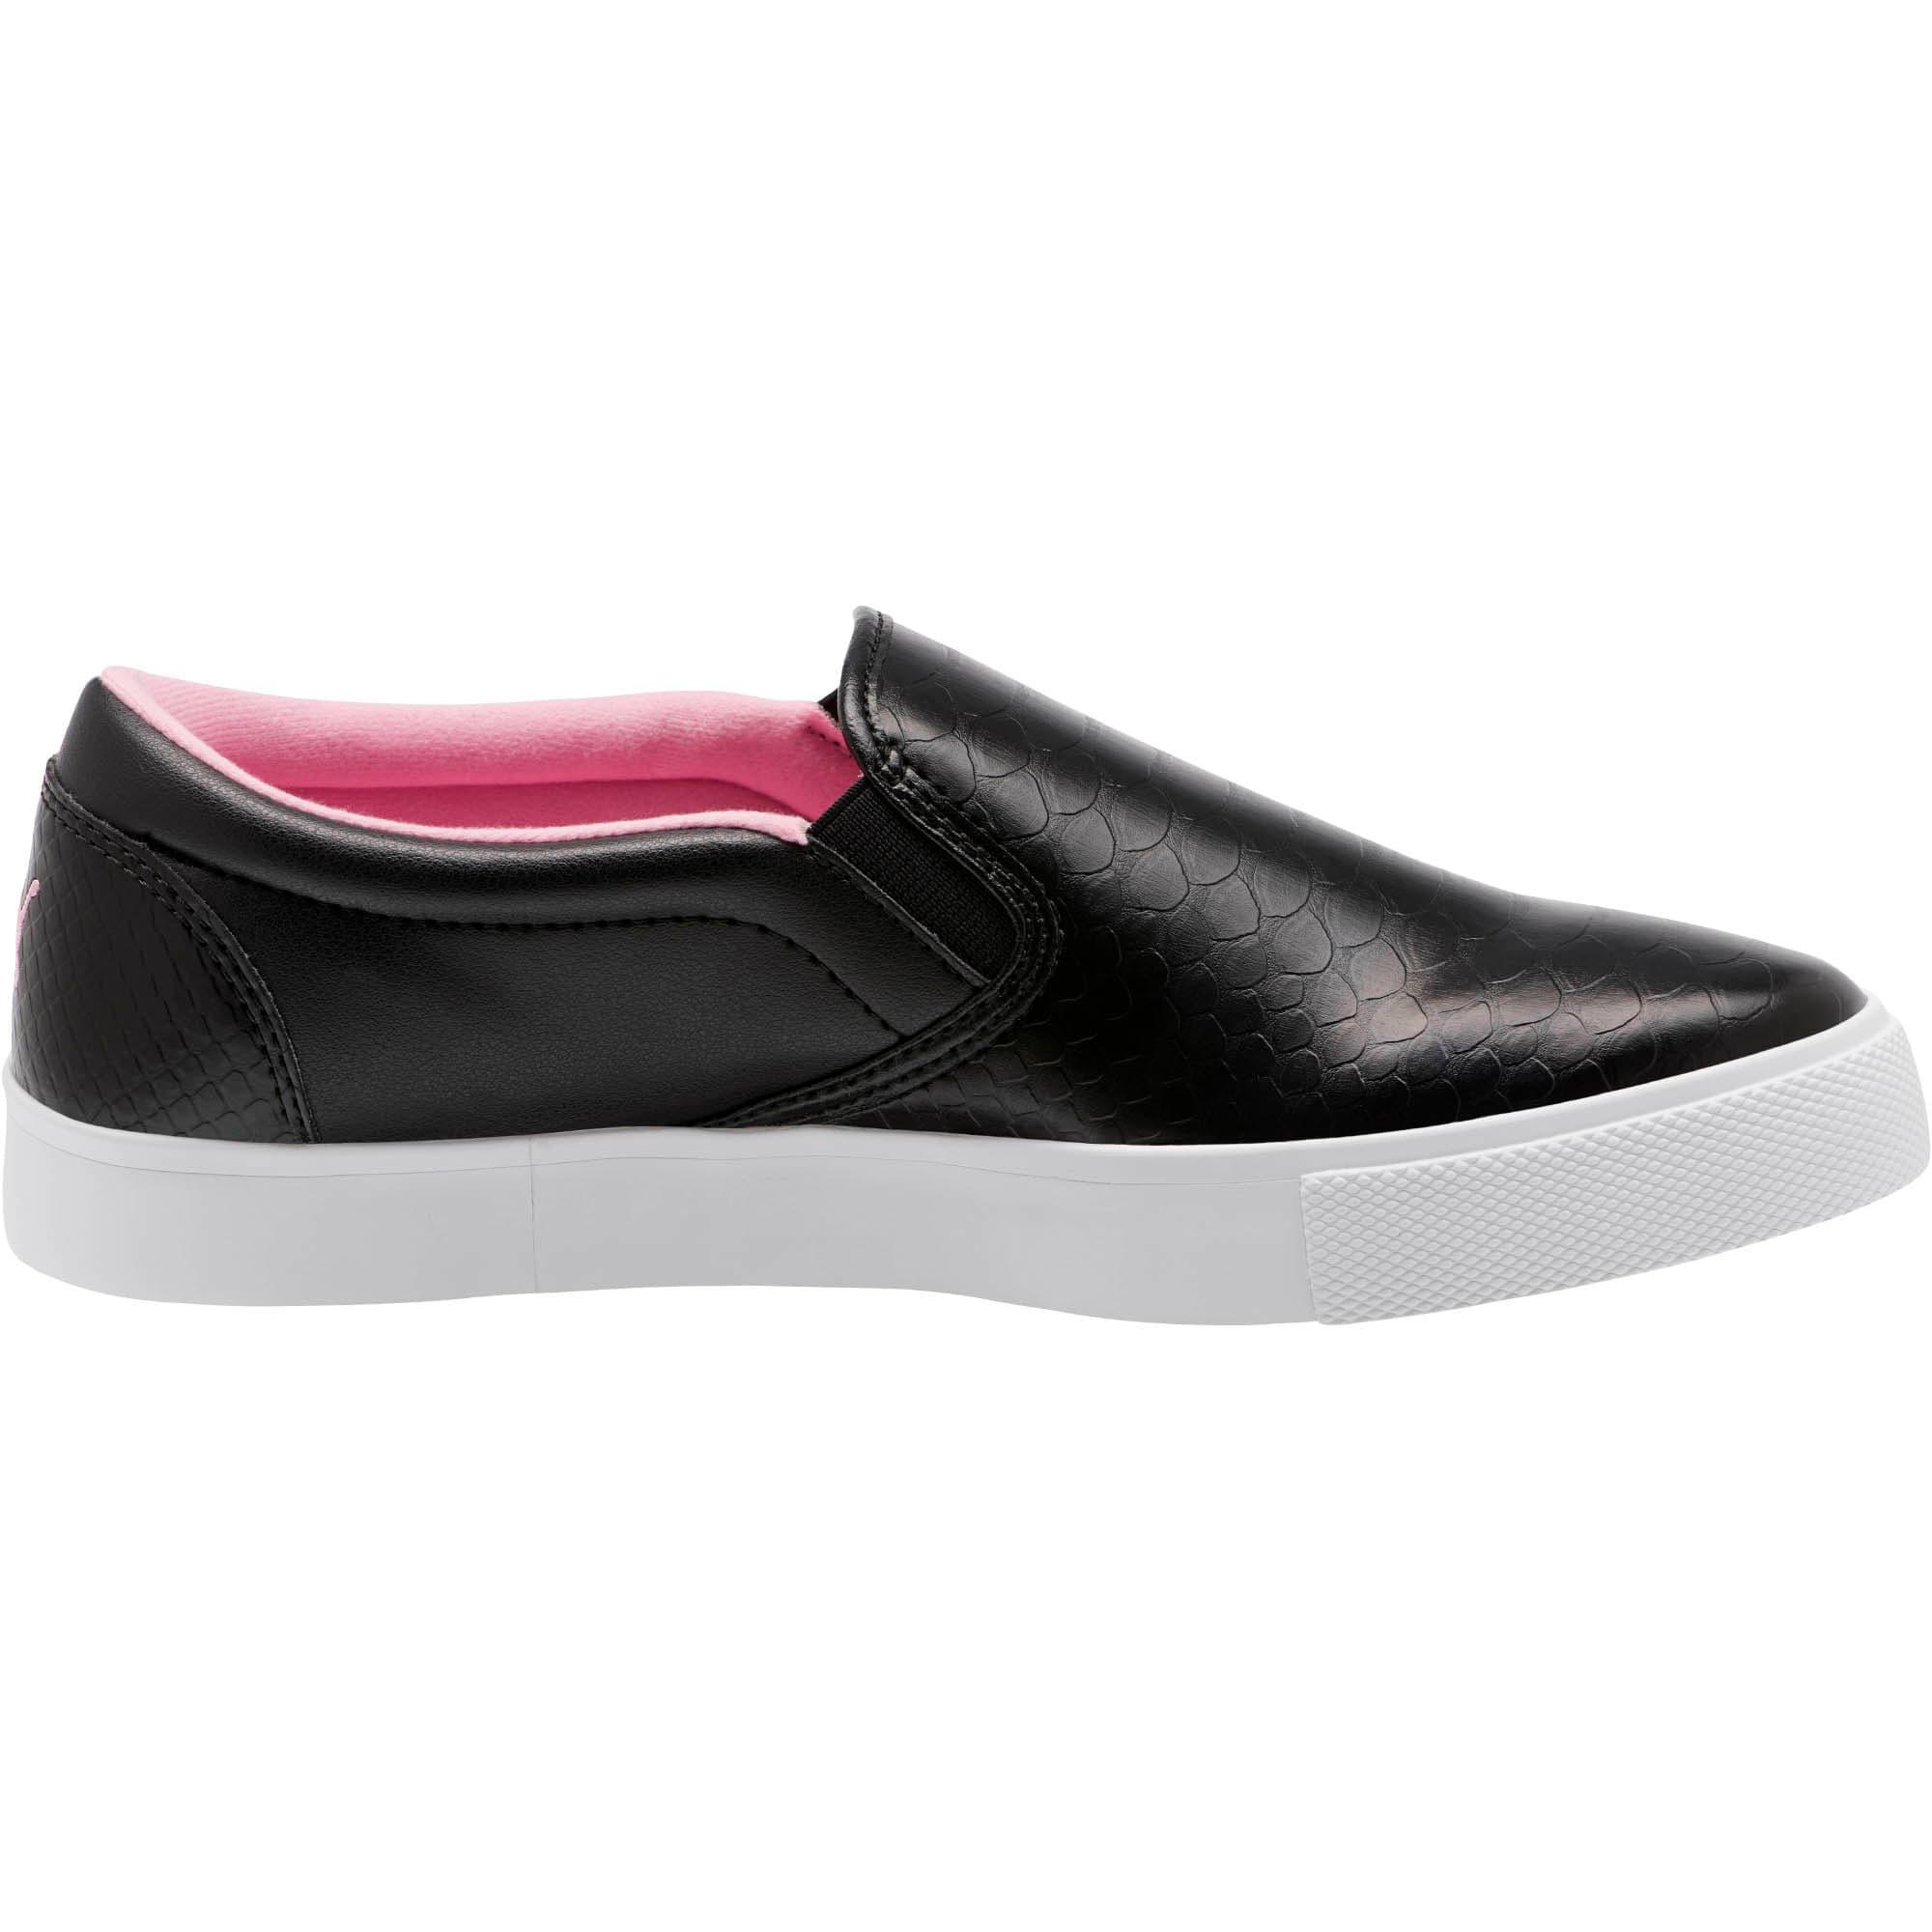 Thumbnail 4 of Tustin Women's Slip-On Golf Shoes, Black-PRISM PINK, medium